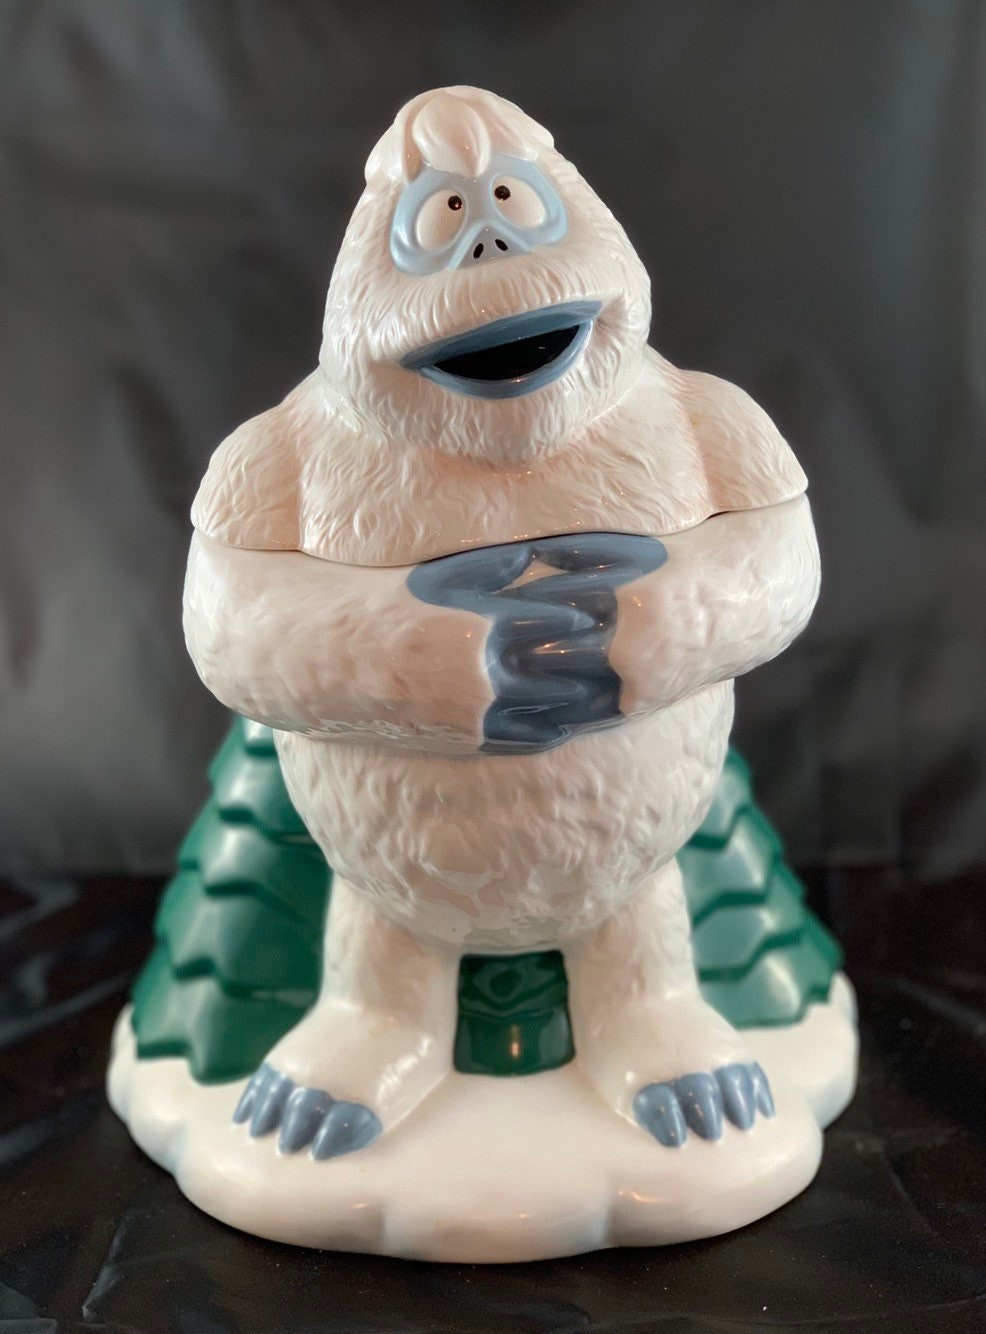 Enesco Bumble Abominable Snowman Cookie Jar